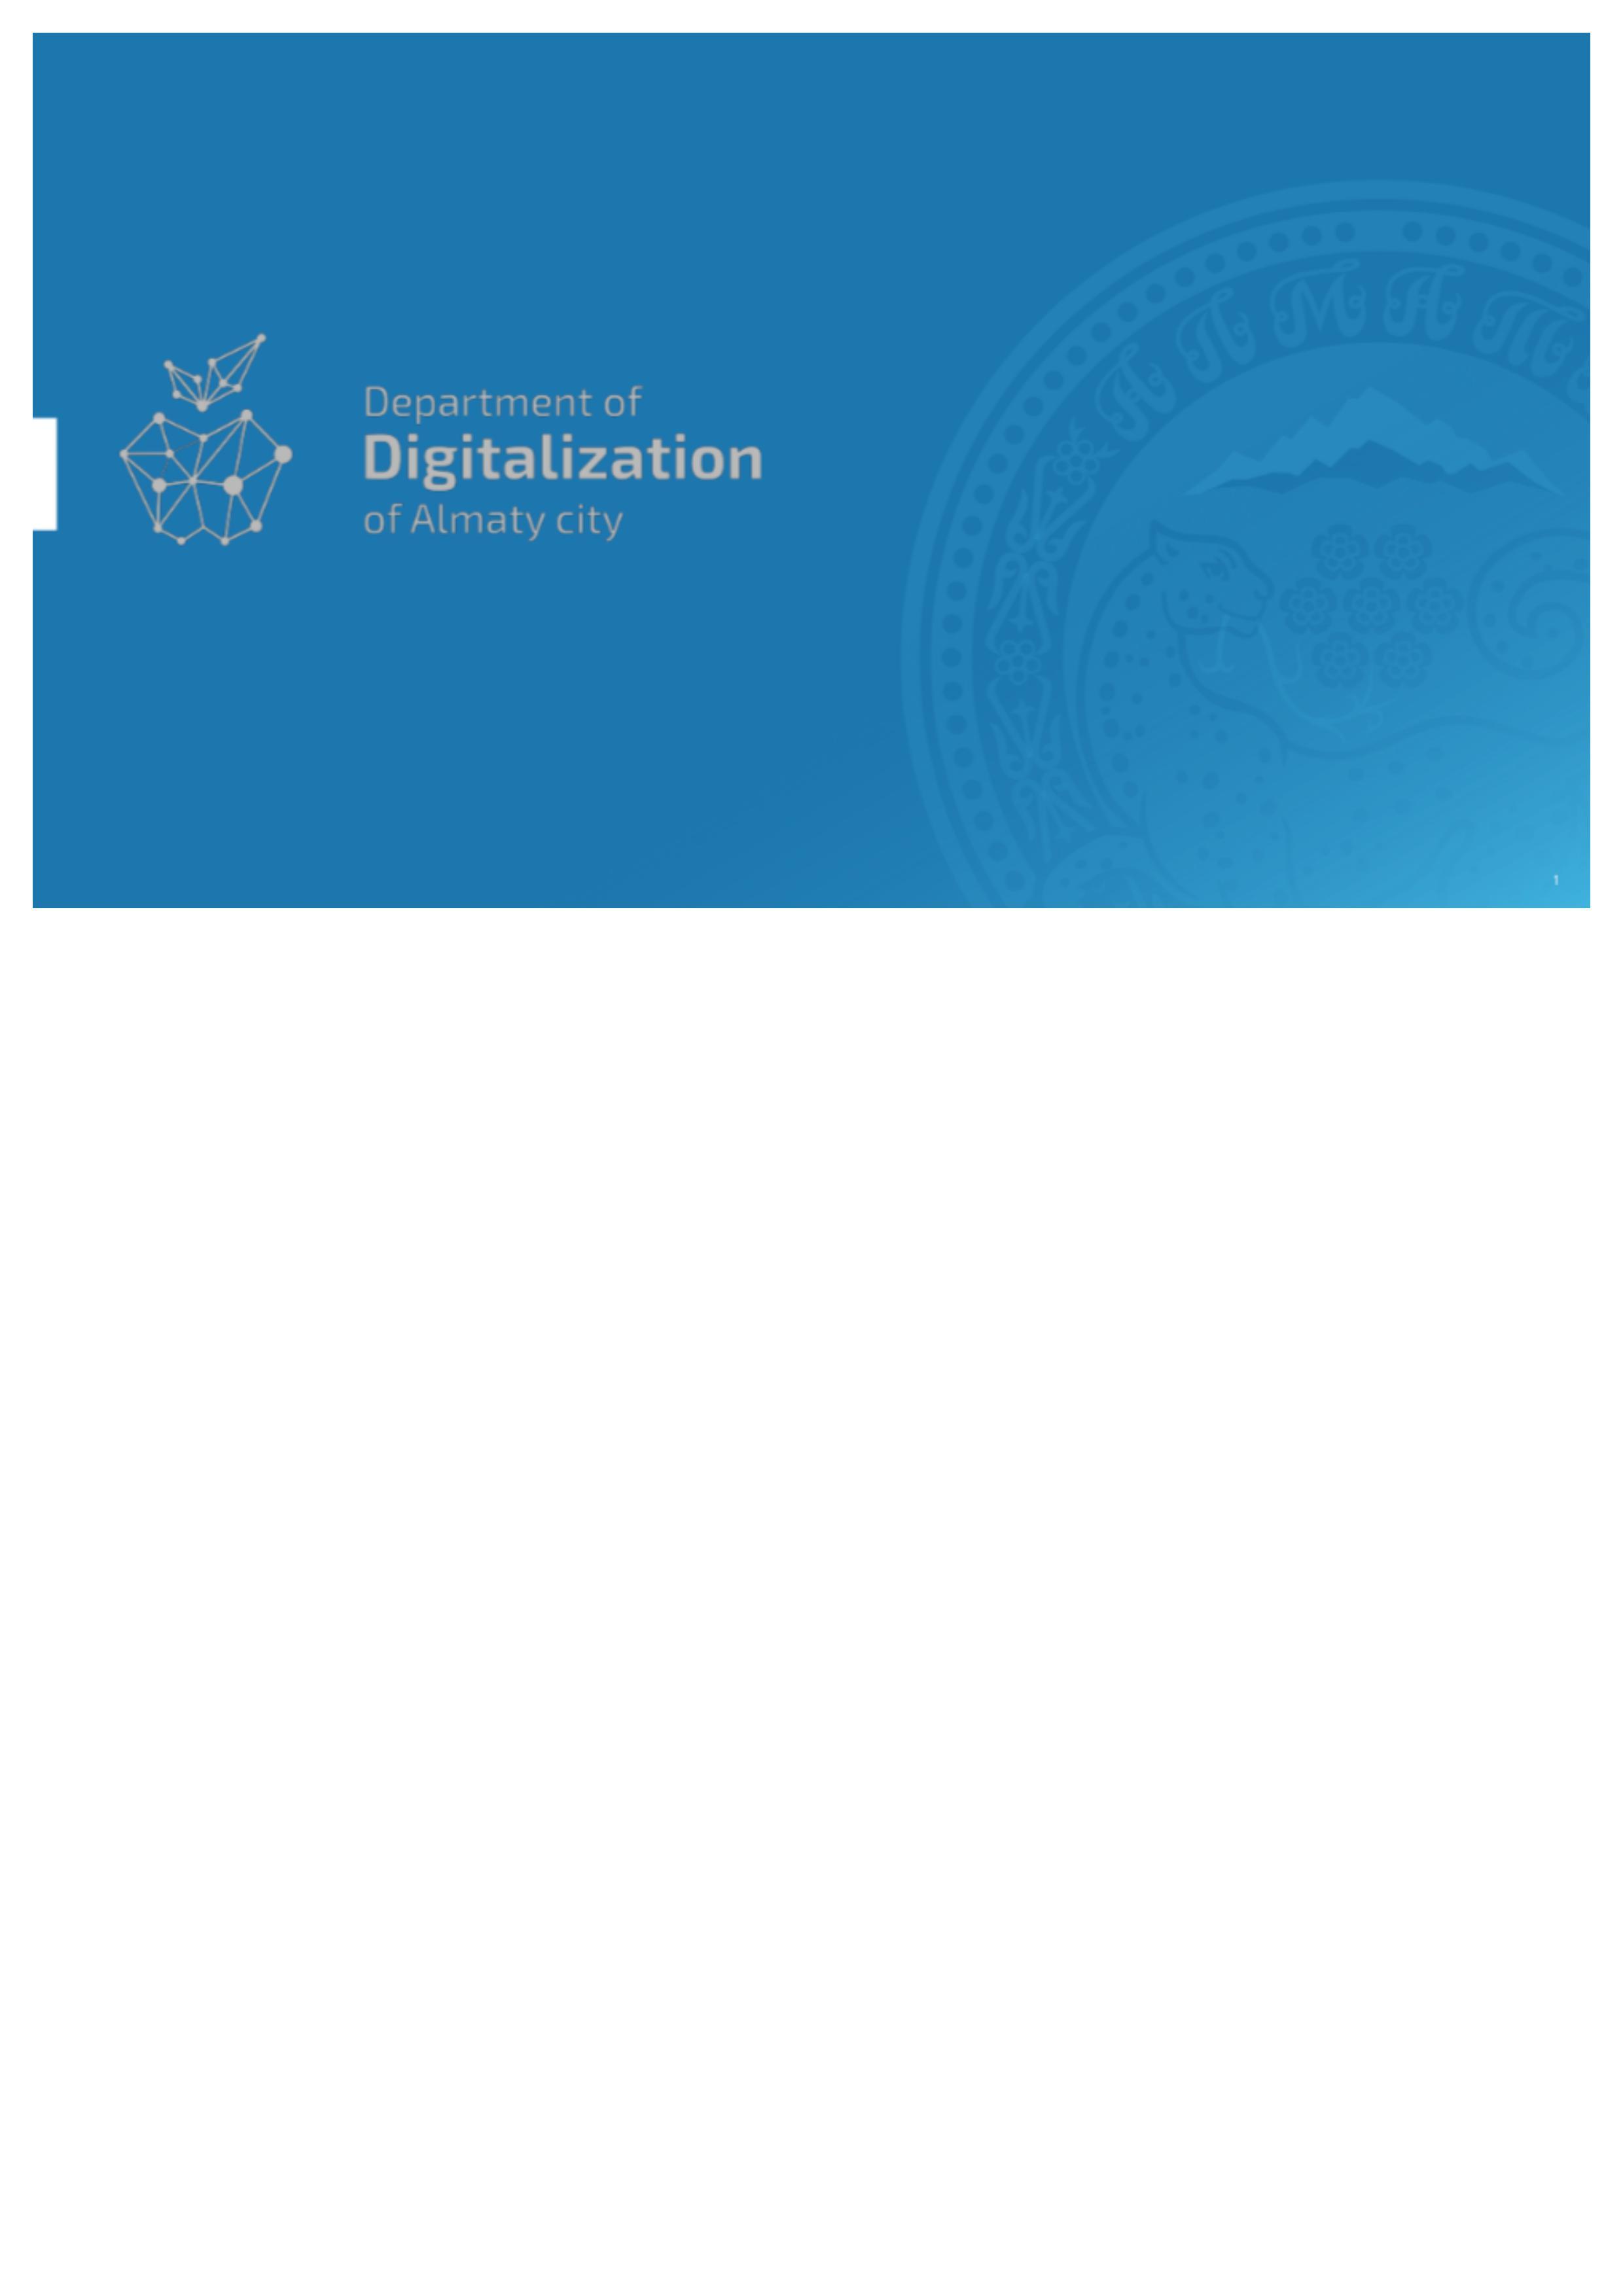 Experience of Kazakhstan: Digitalization of Almaty city